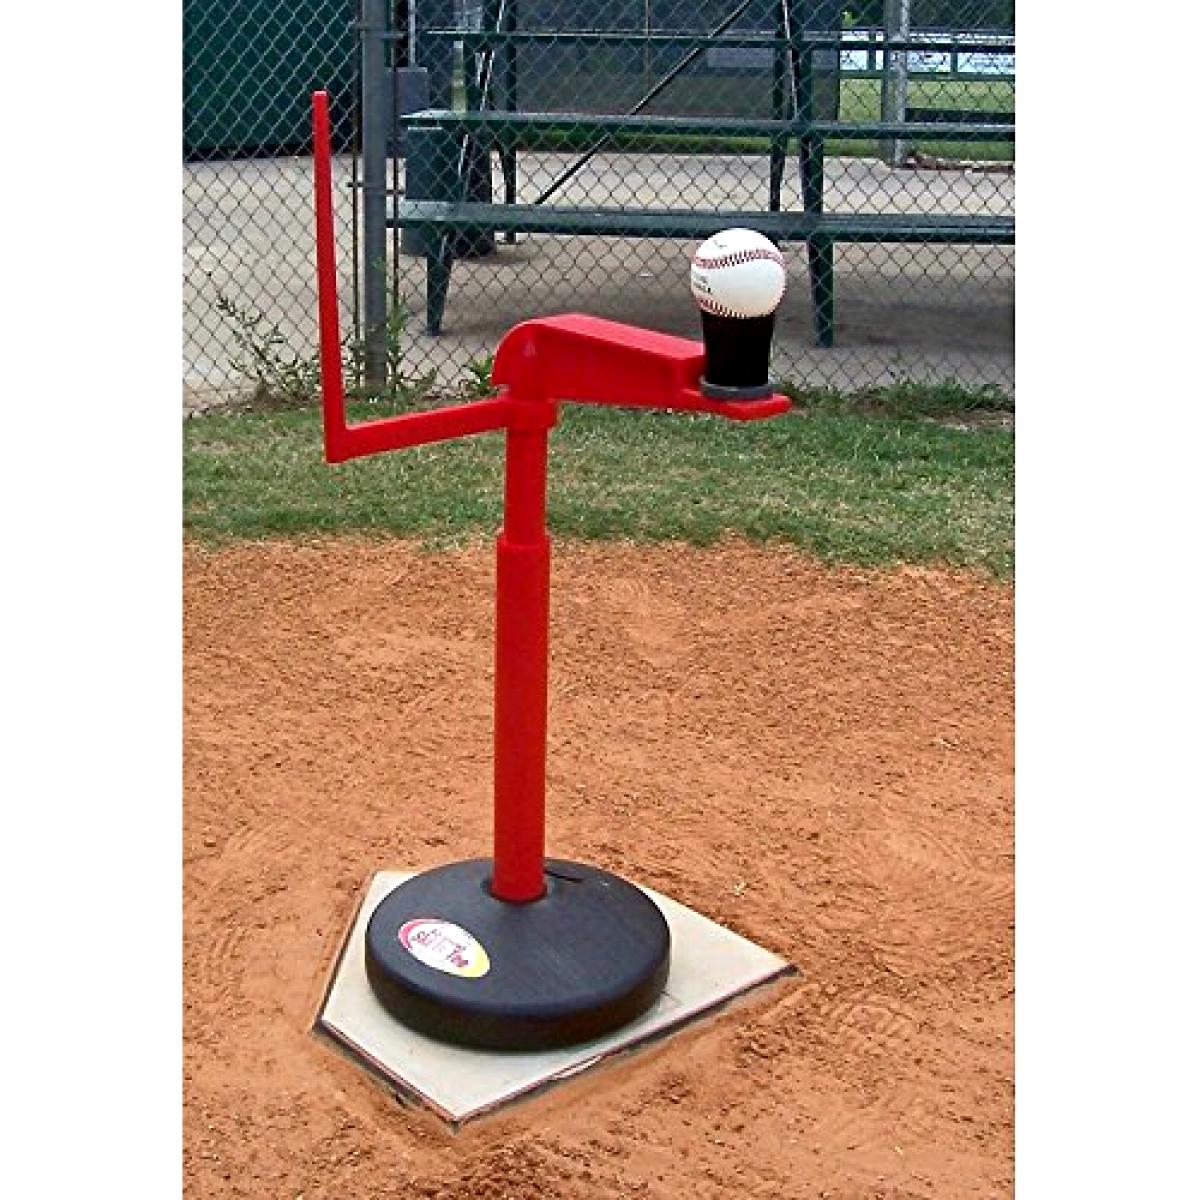 Muhl Sports Advanced Skills Batting Tee Aid, Professional Baseball Training Aid, Tee New c5e592